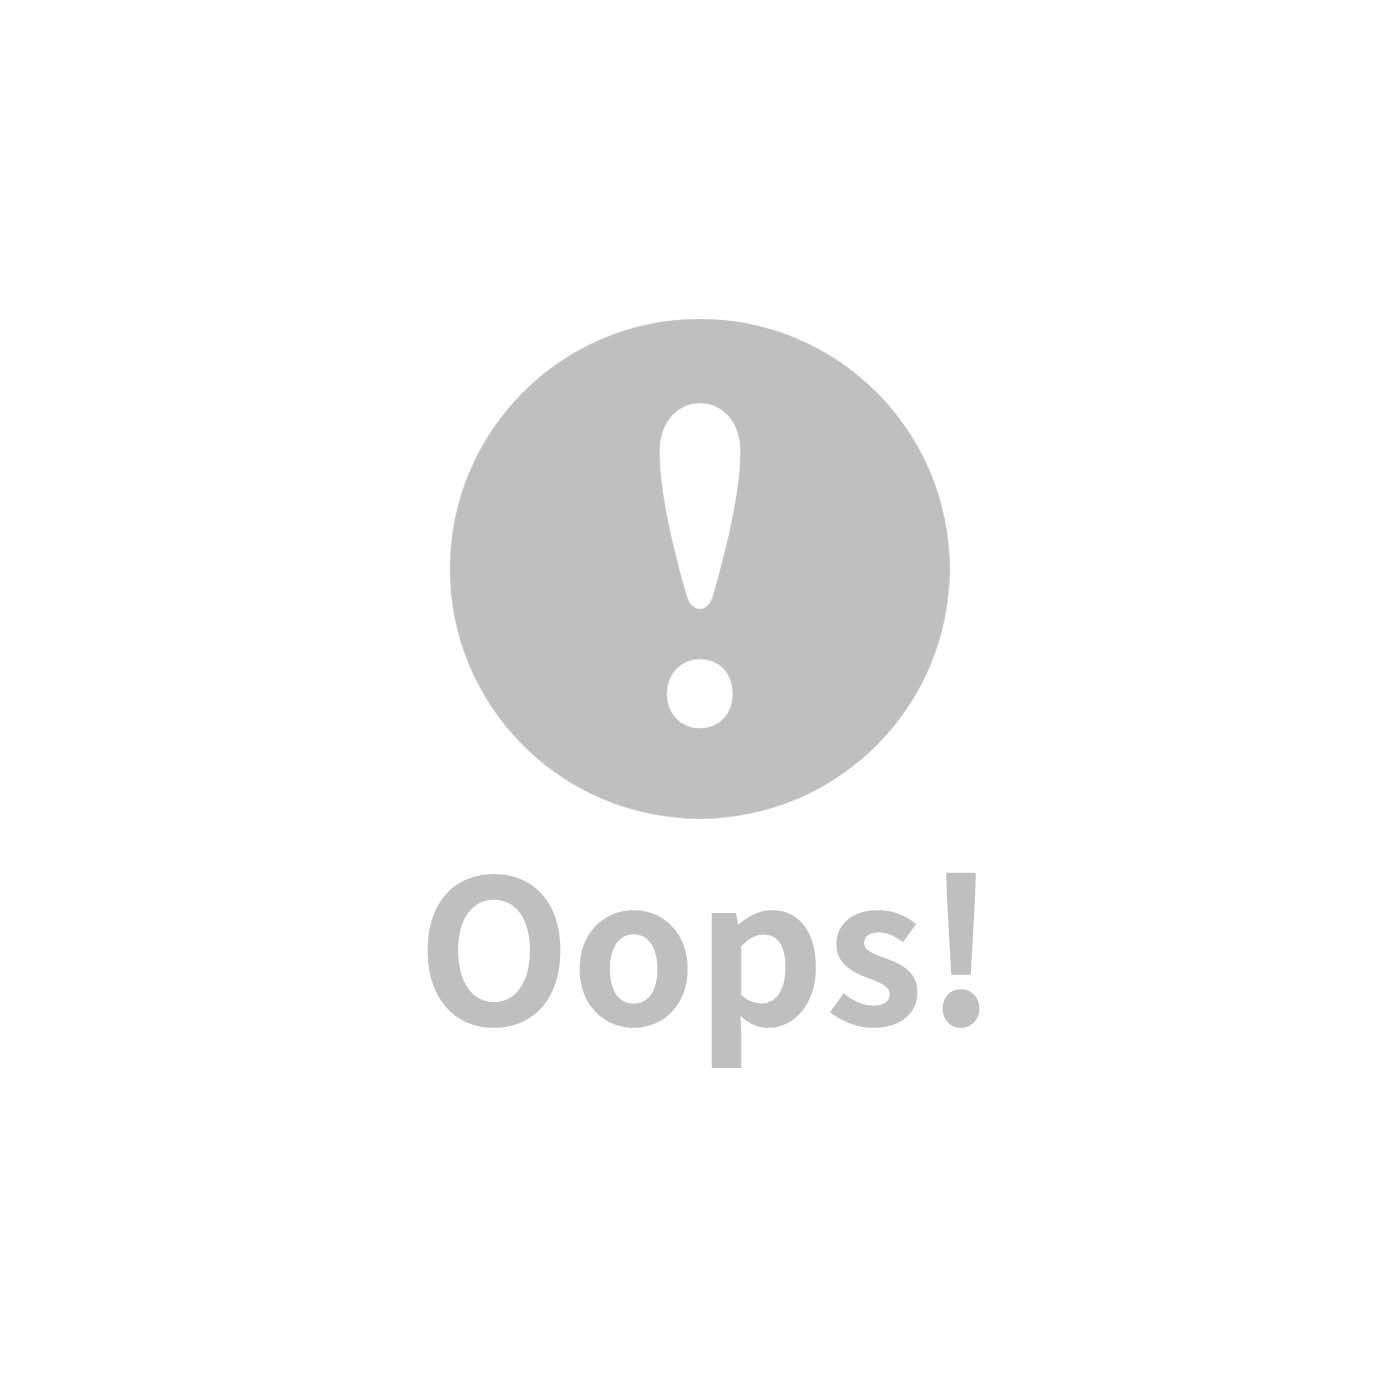 【新生標配組】air cossi 透氣天絲床墊+La Millou巧柔豆豆毯(標準款)